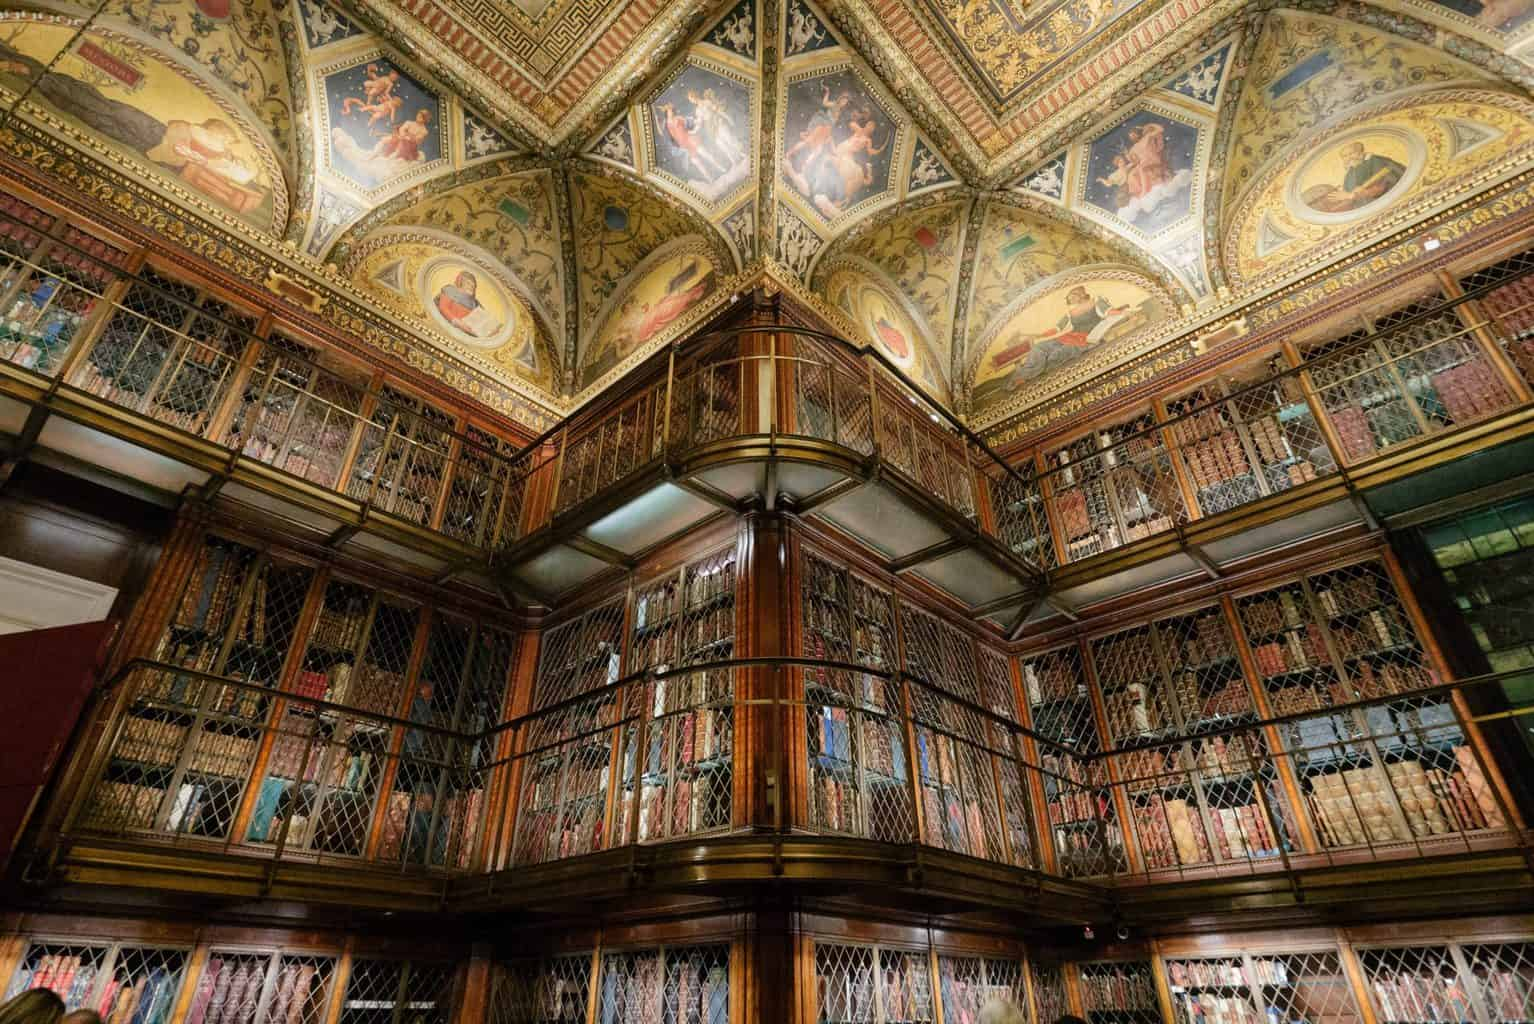 The Morgan Public Library